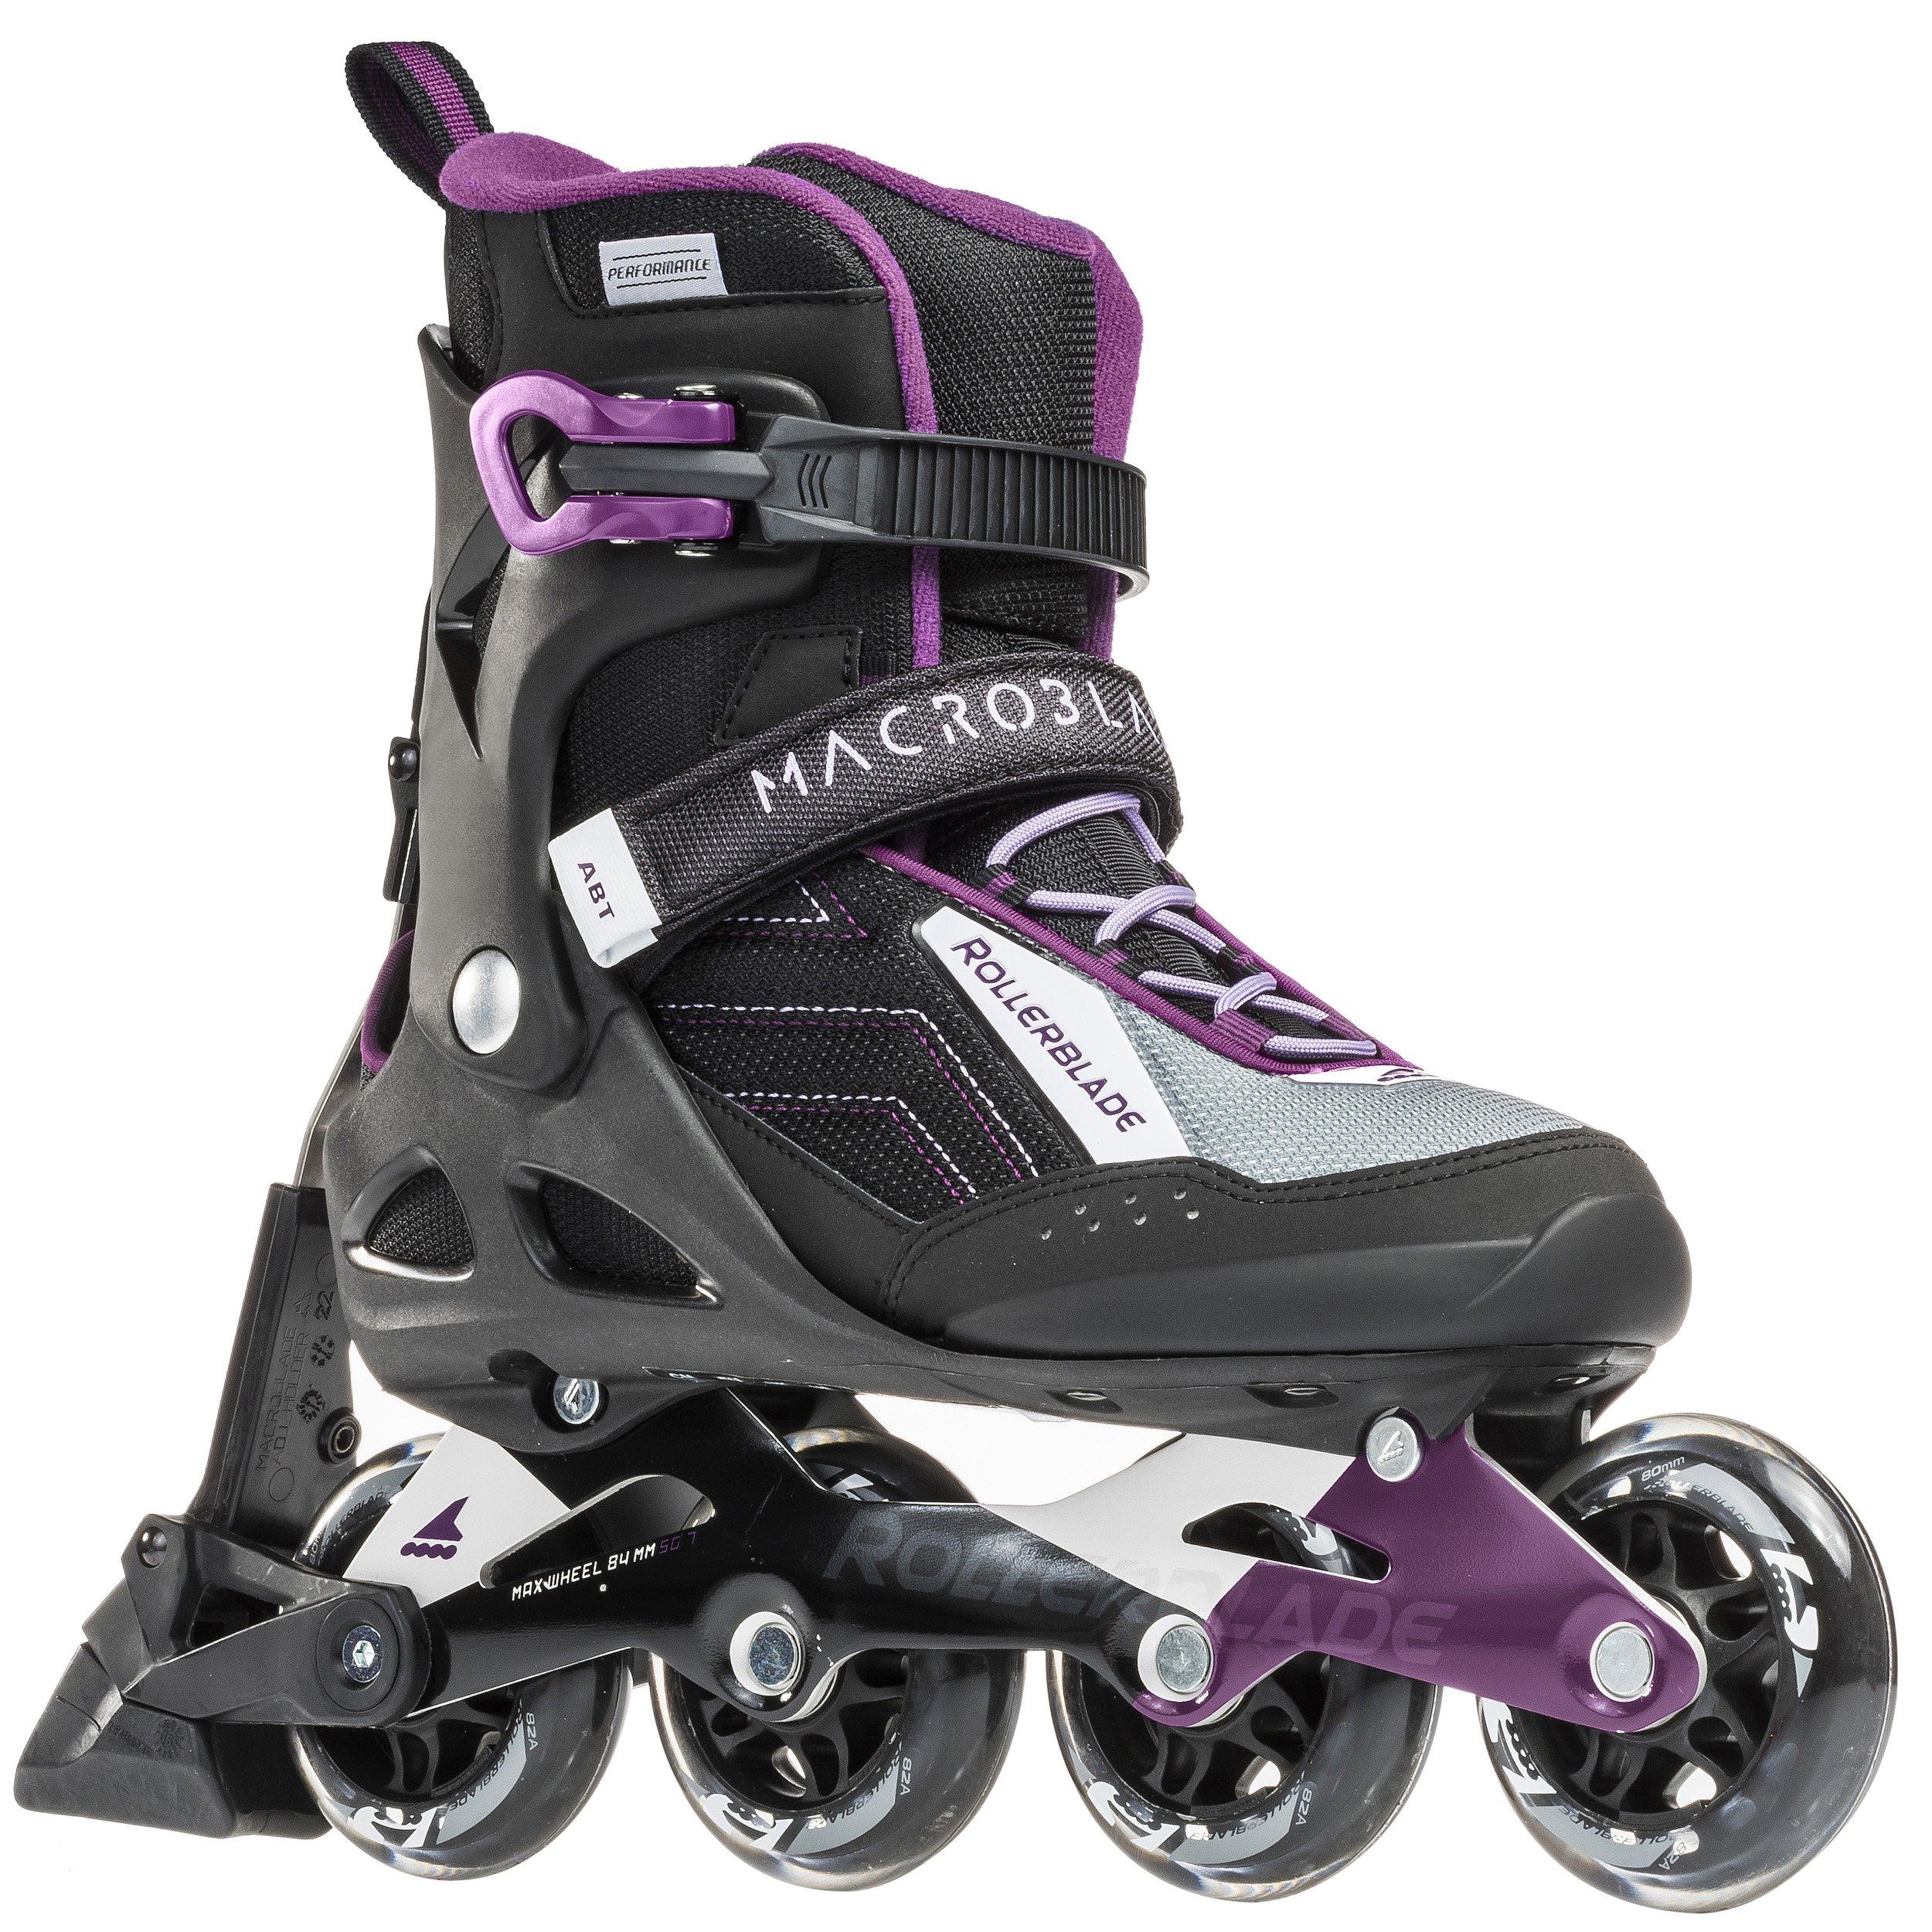 Rollerblade Macroblade W 80 ABT Specific Fit SG7 Bearings Inline Skates, Black/Purple, US Women's 8.5